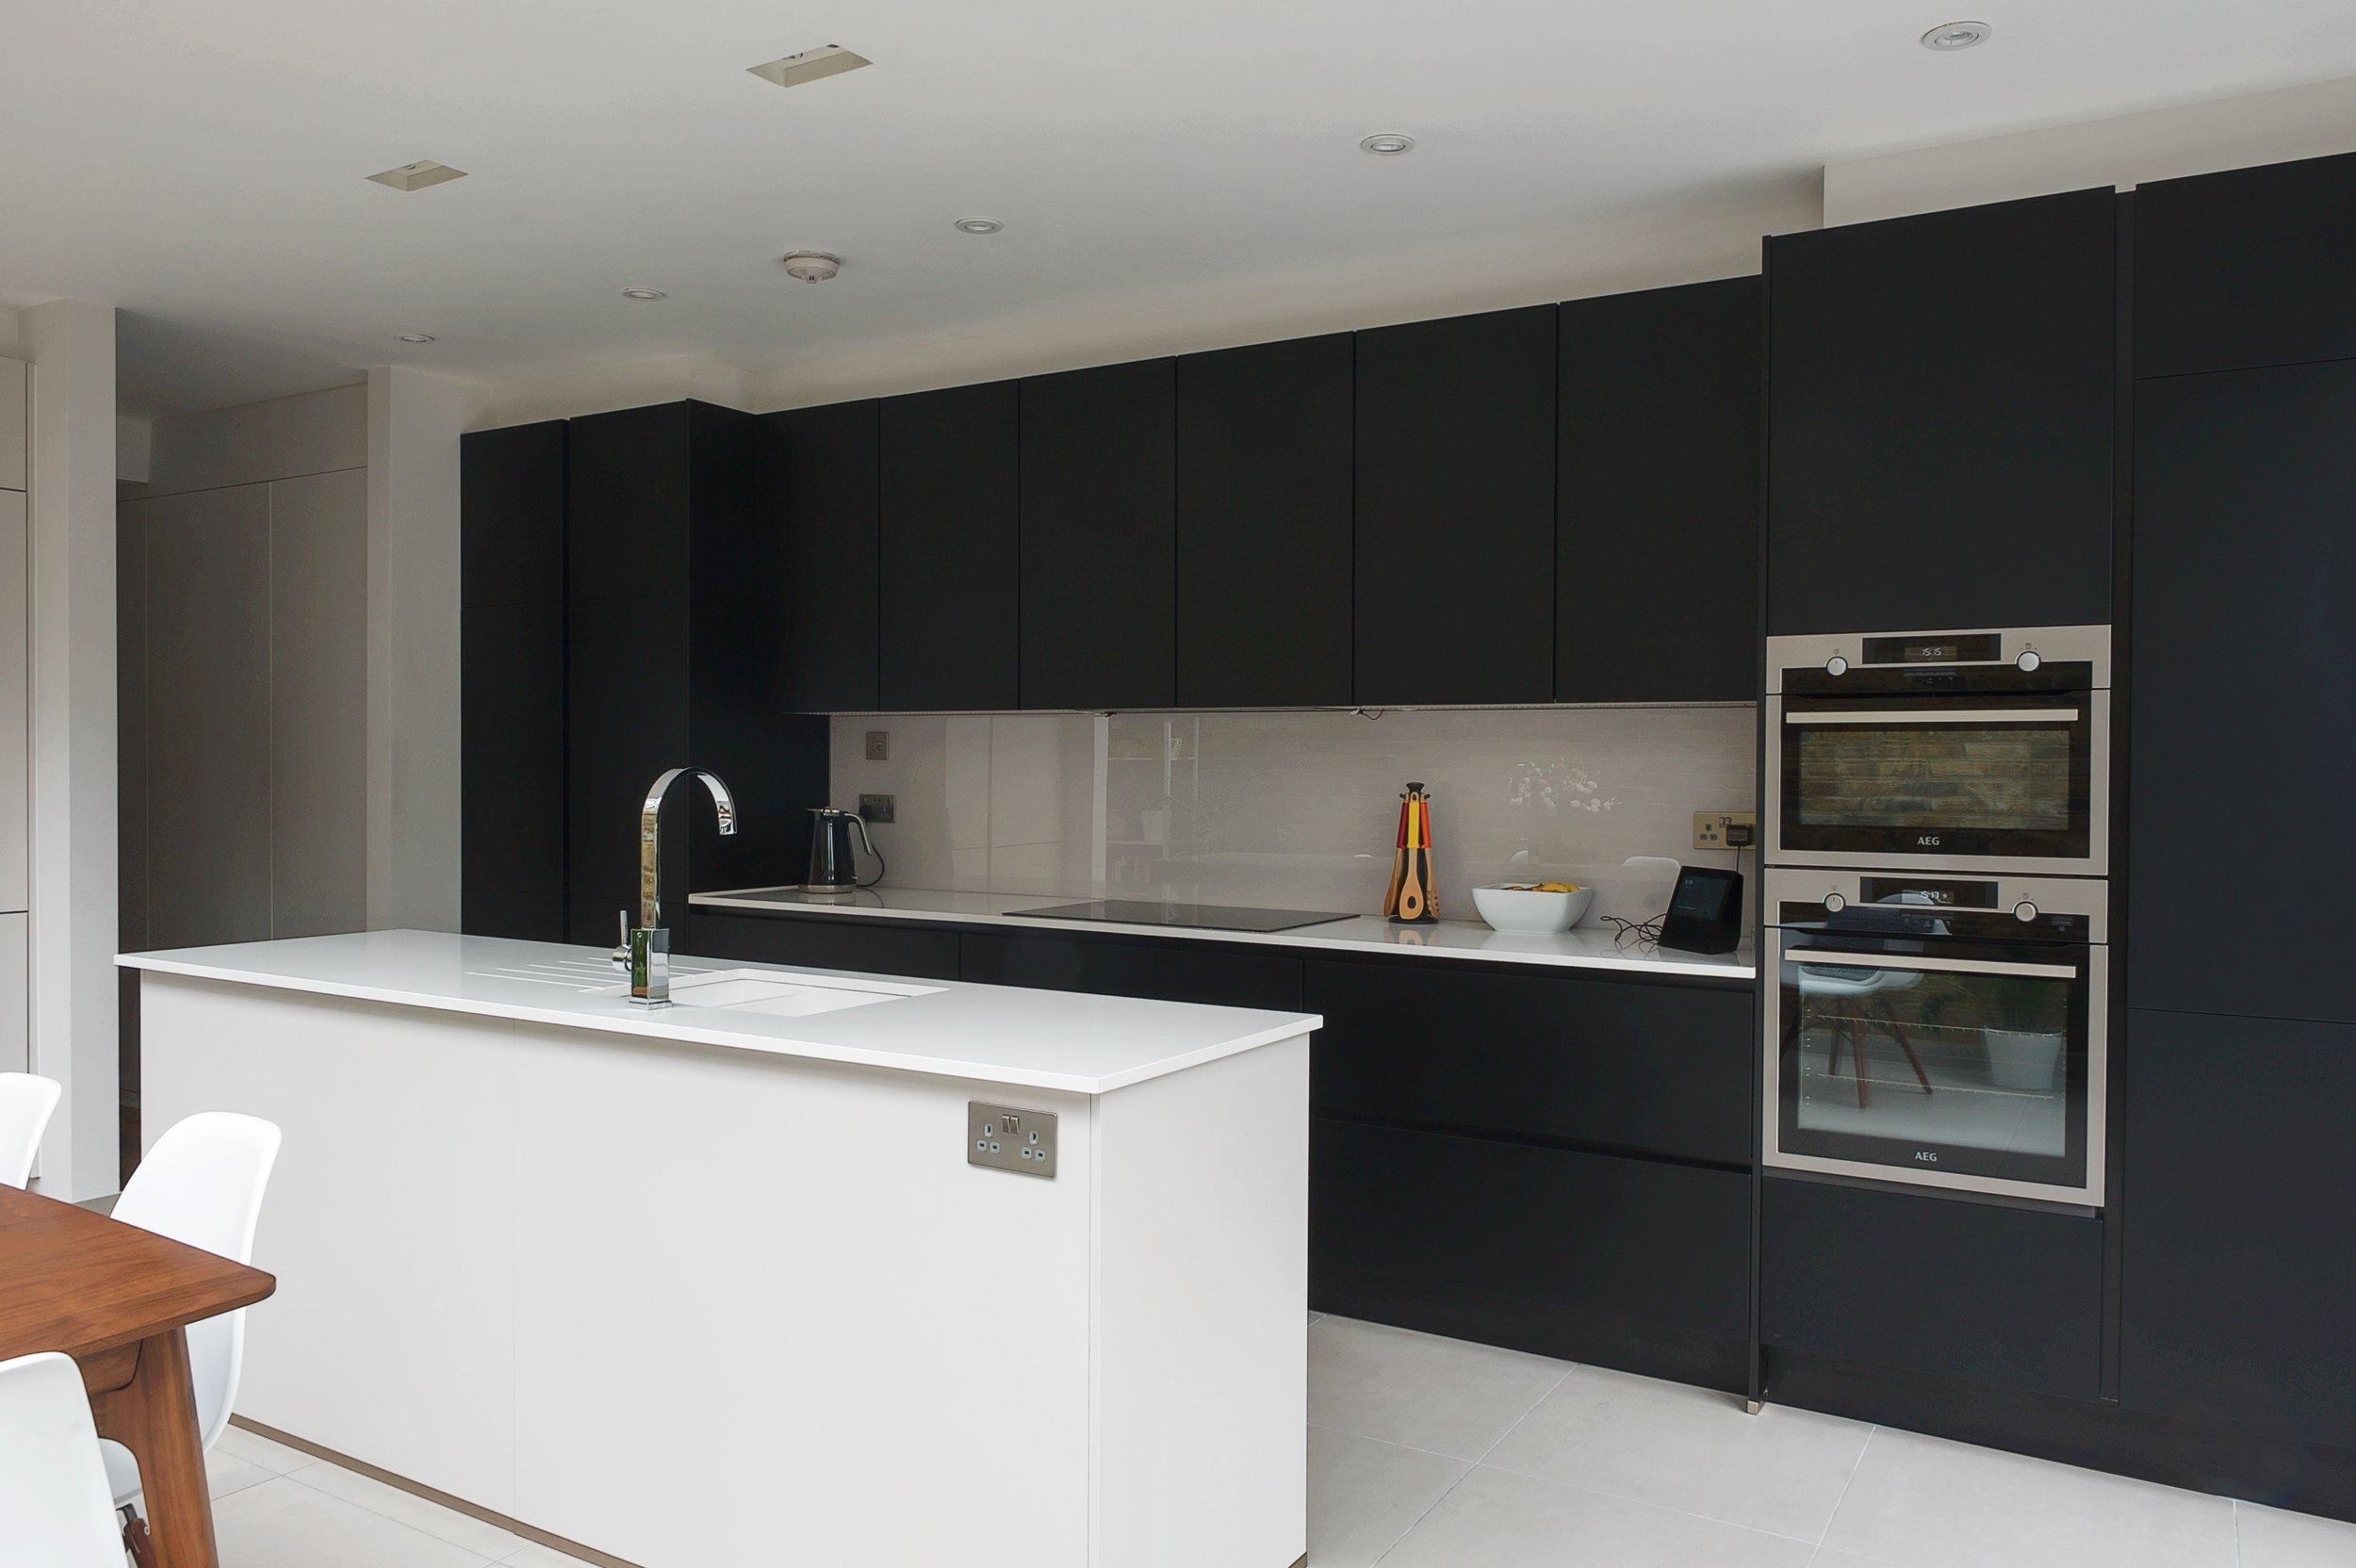 swallowfield-road-kitchen-4.jpg